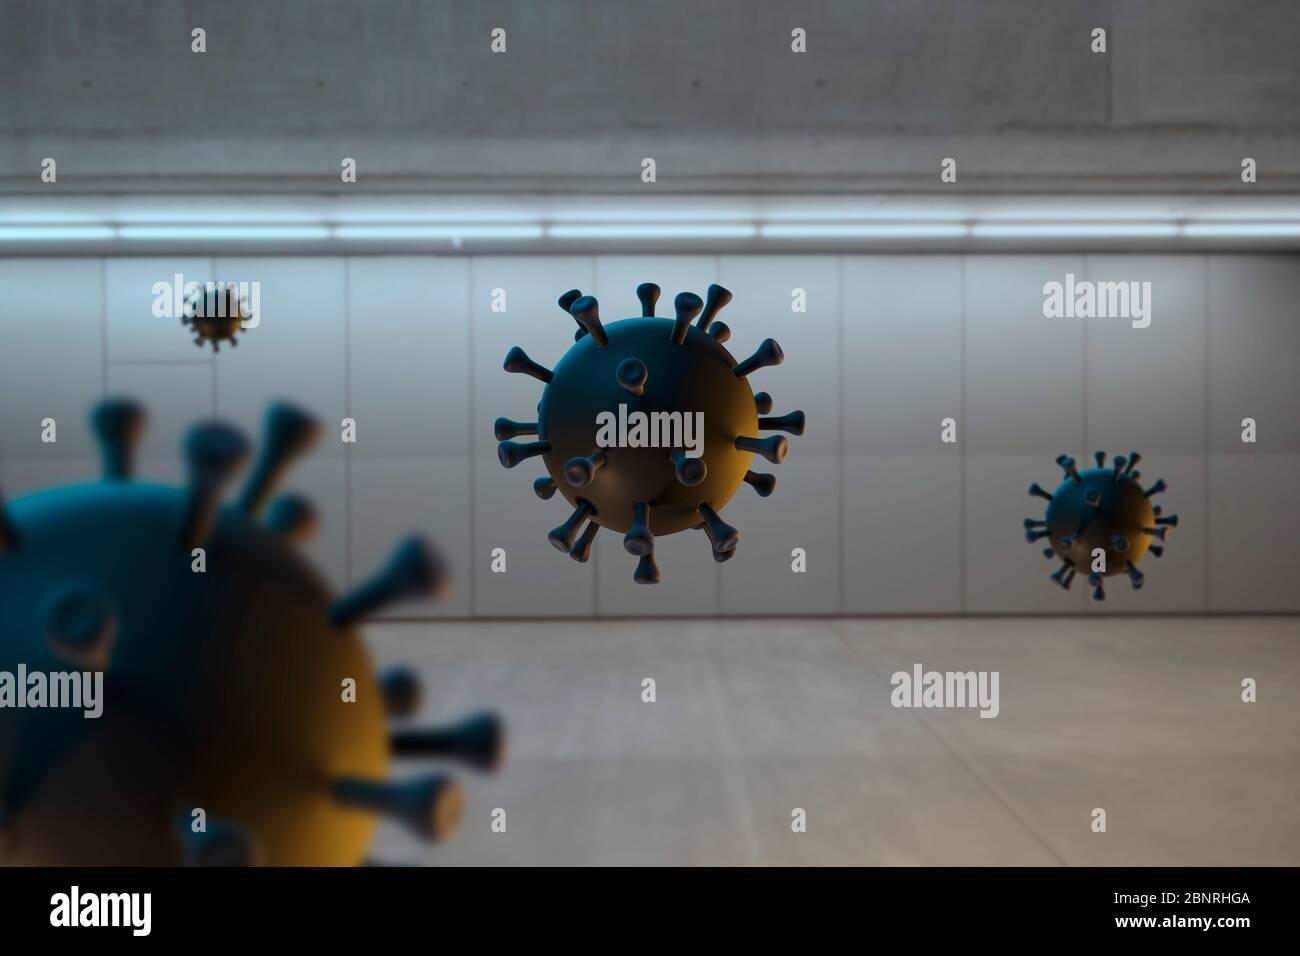 Corona viruses against a dark architectural background Stock Photo